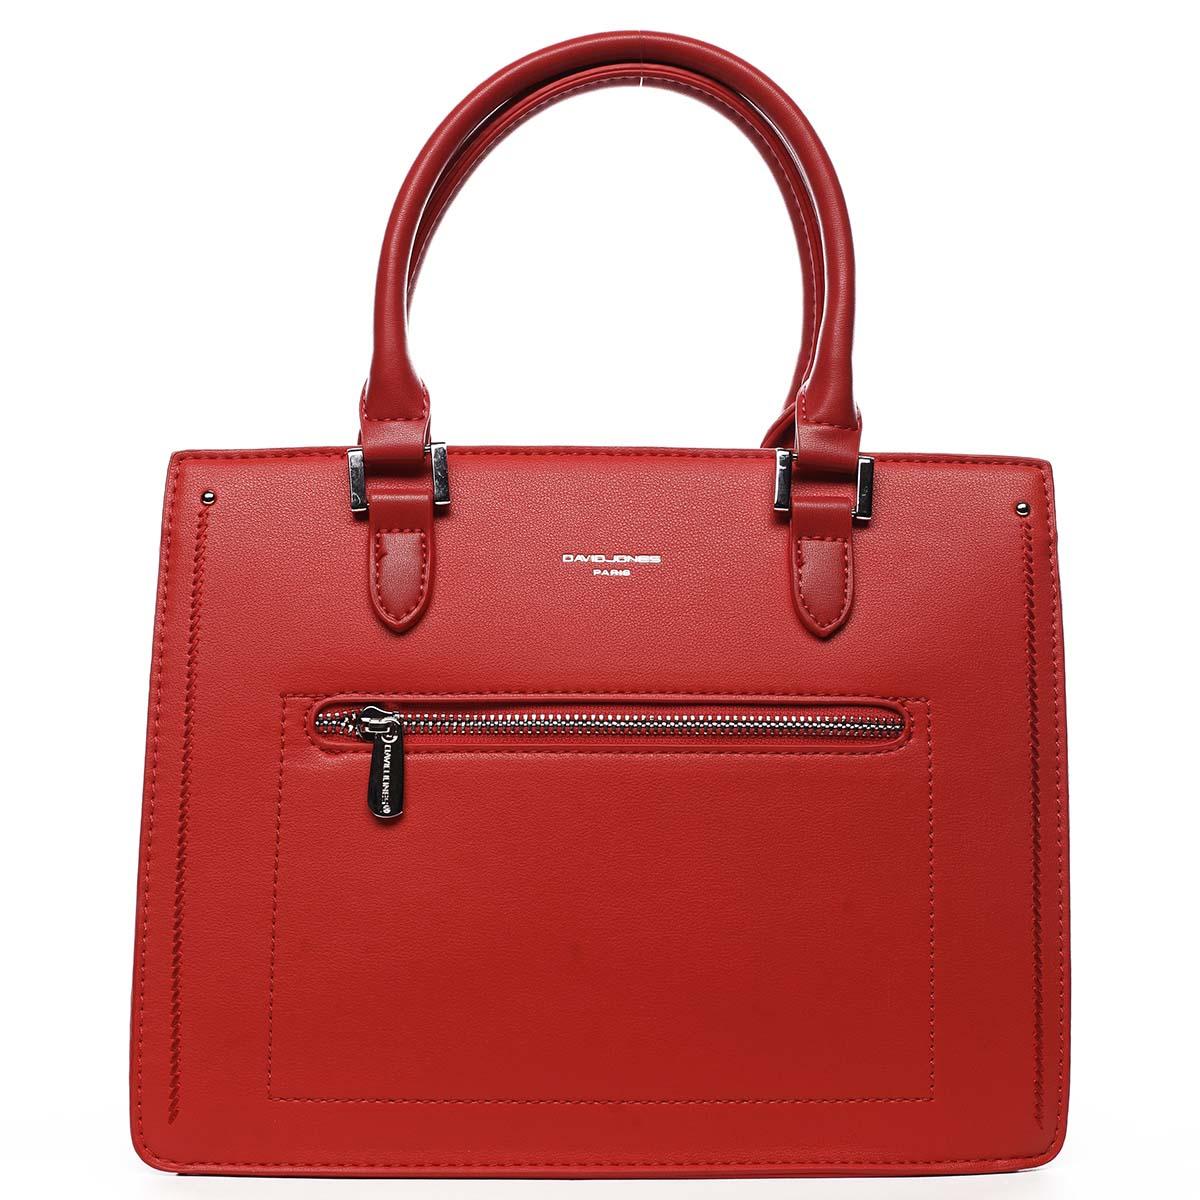 Dámska kabelka do ruky červená - David Jones Samentha